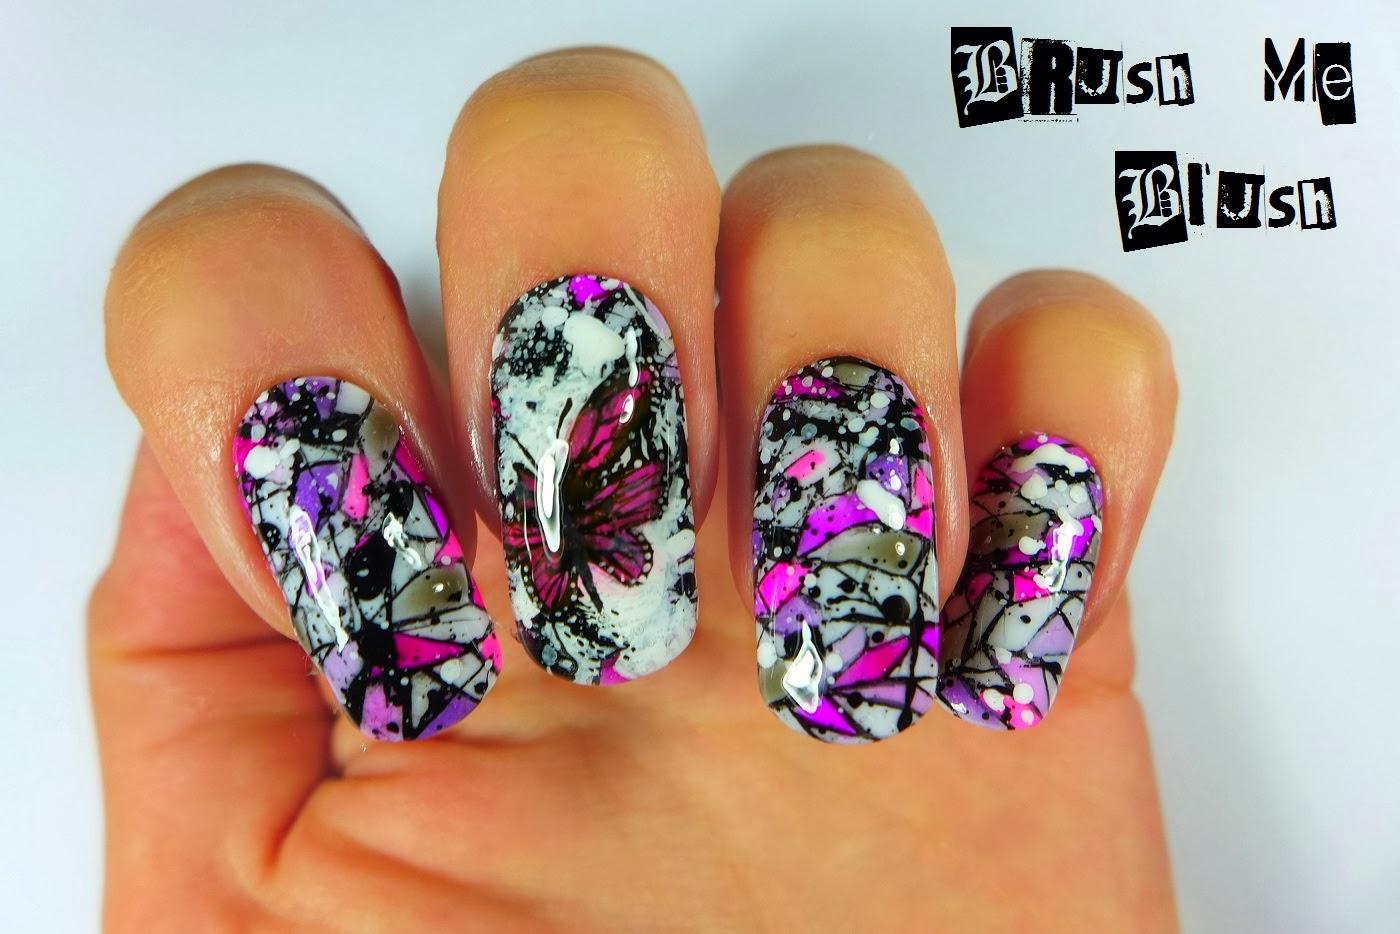 Full color nail art - Full Post Here Use The Nail Art Product Magic Color Changing Mood Soak Off Gel Builder Uv Gel